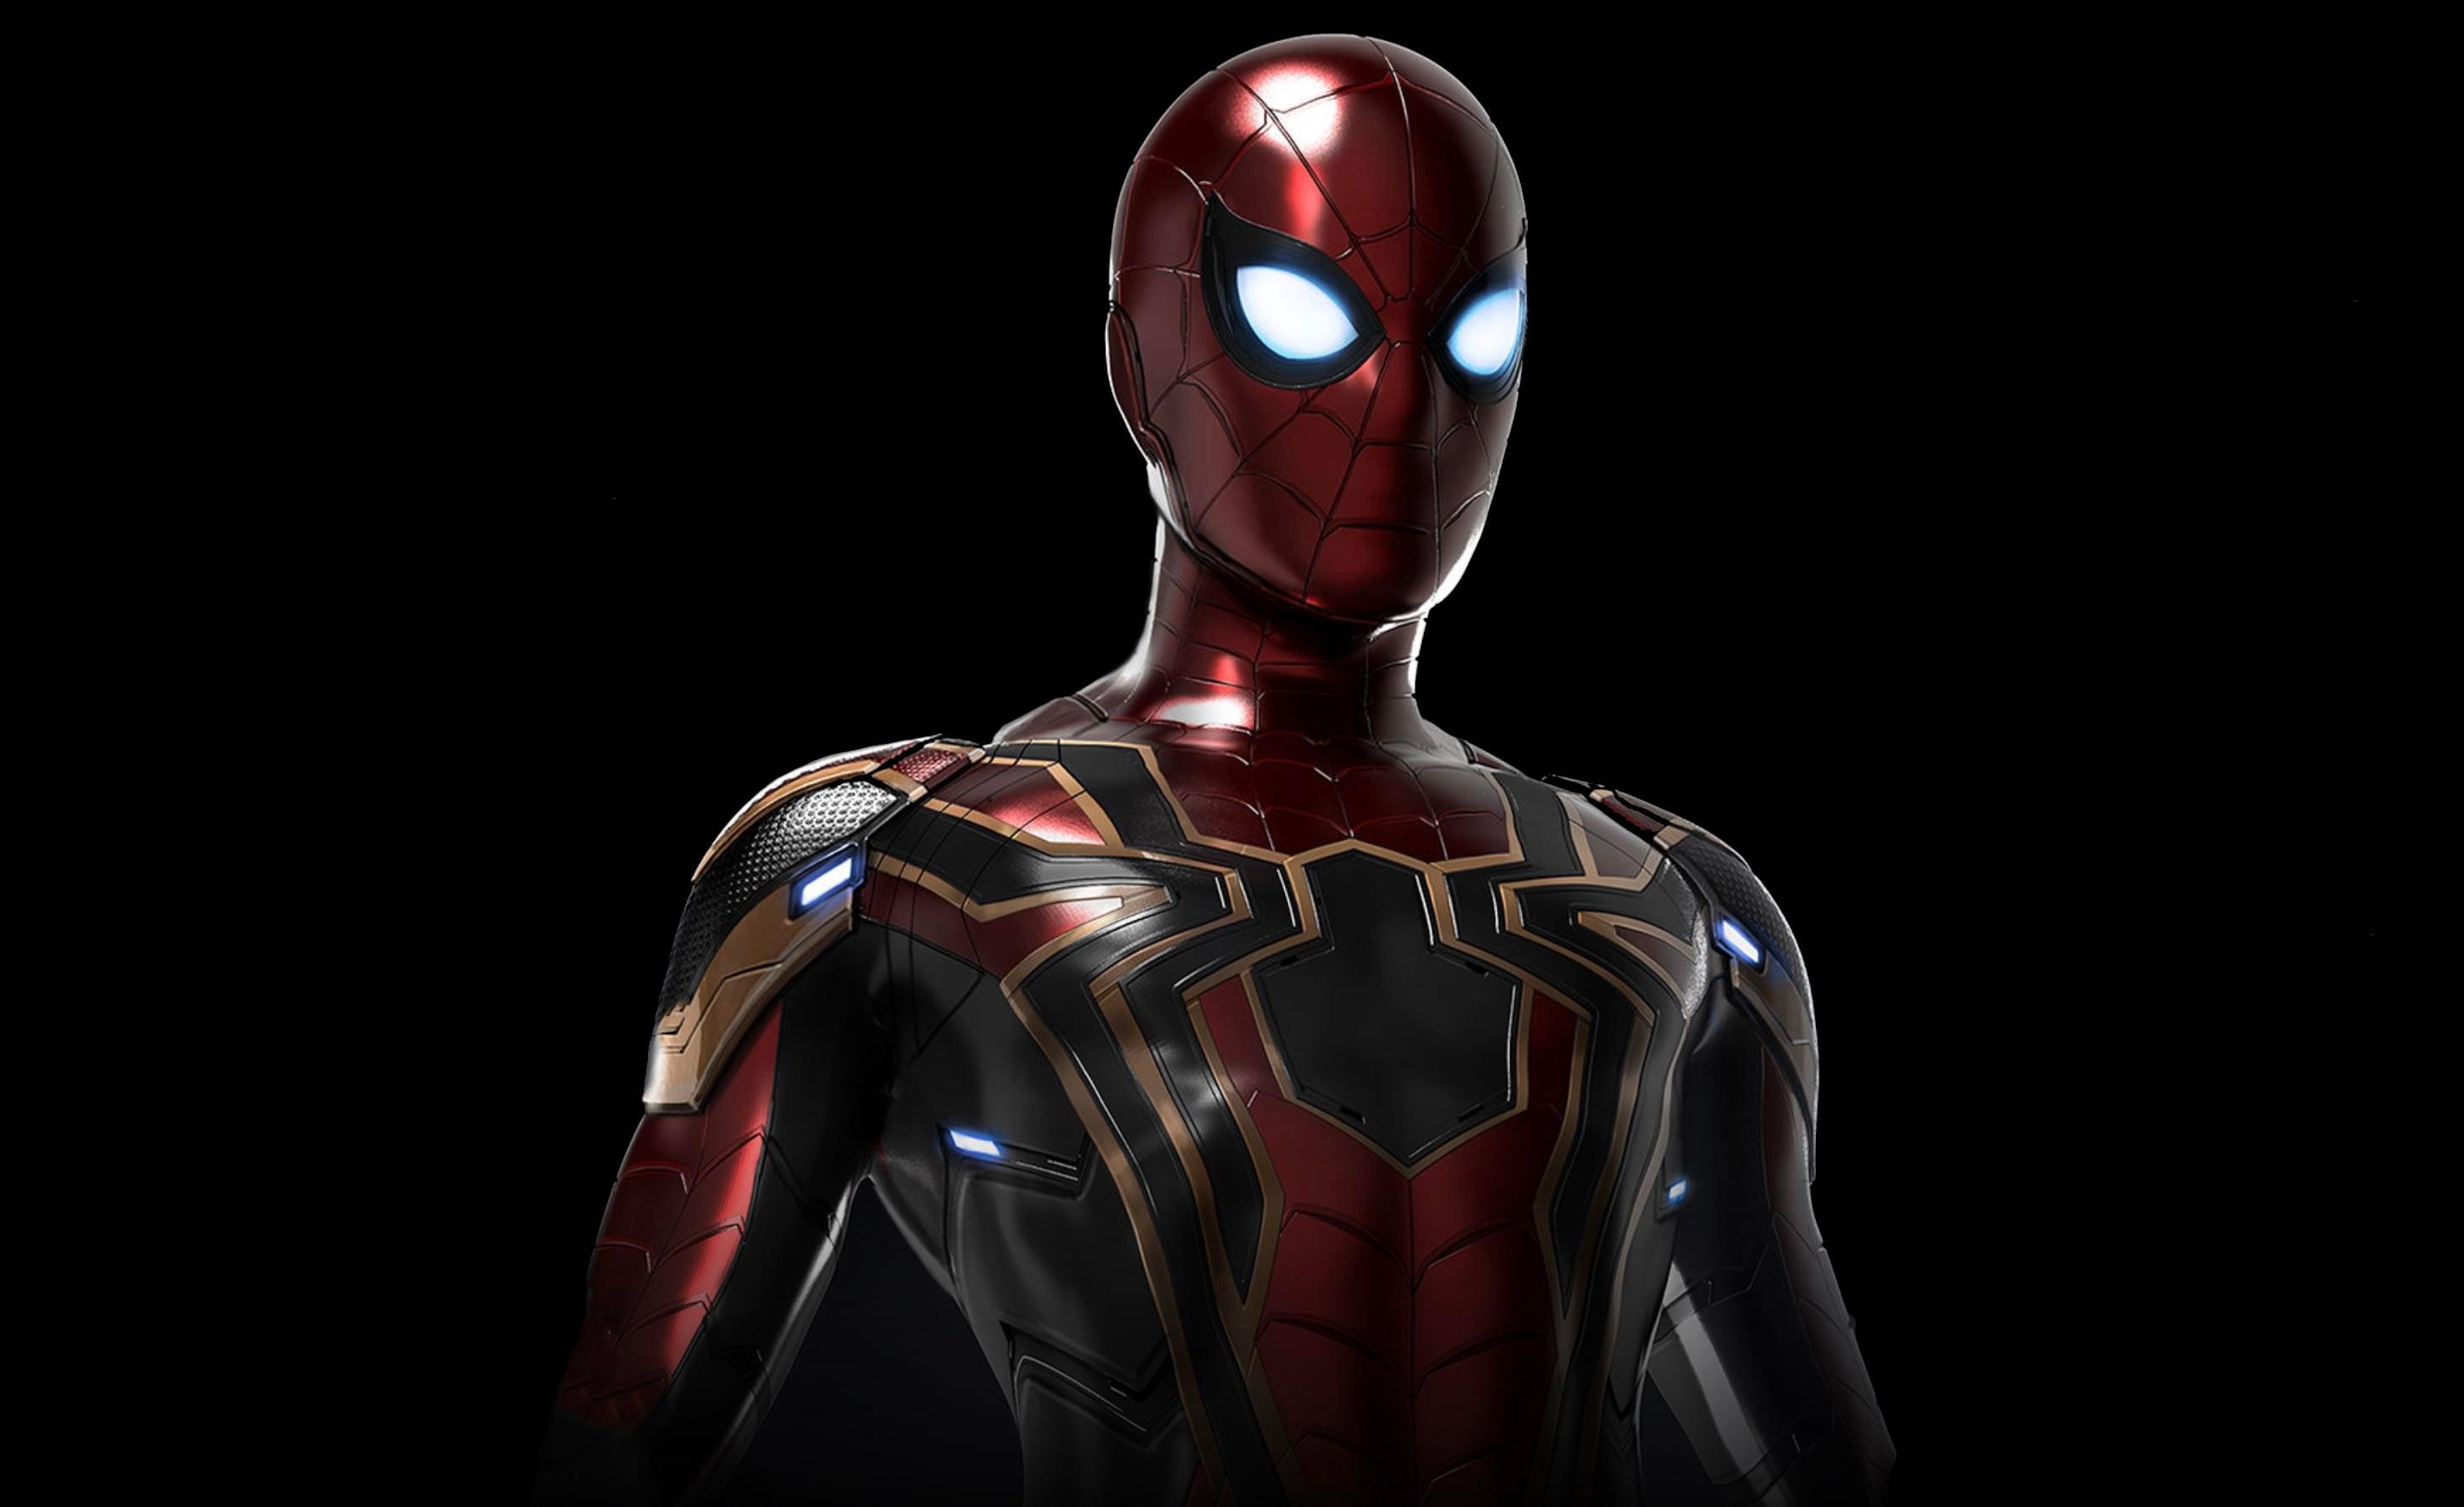 Iron Spider Suit Avengers Infinity War Hd Superheroes 4k